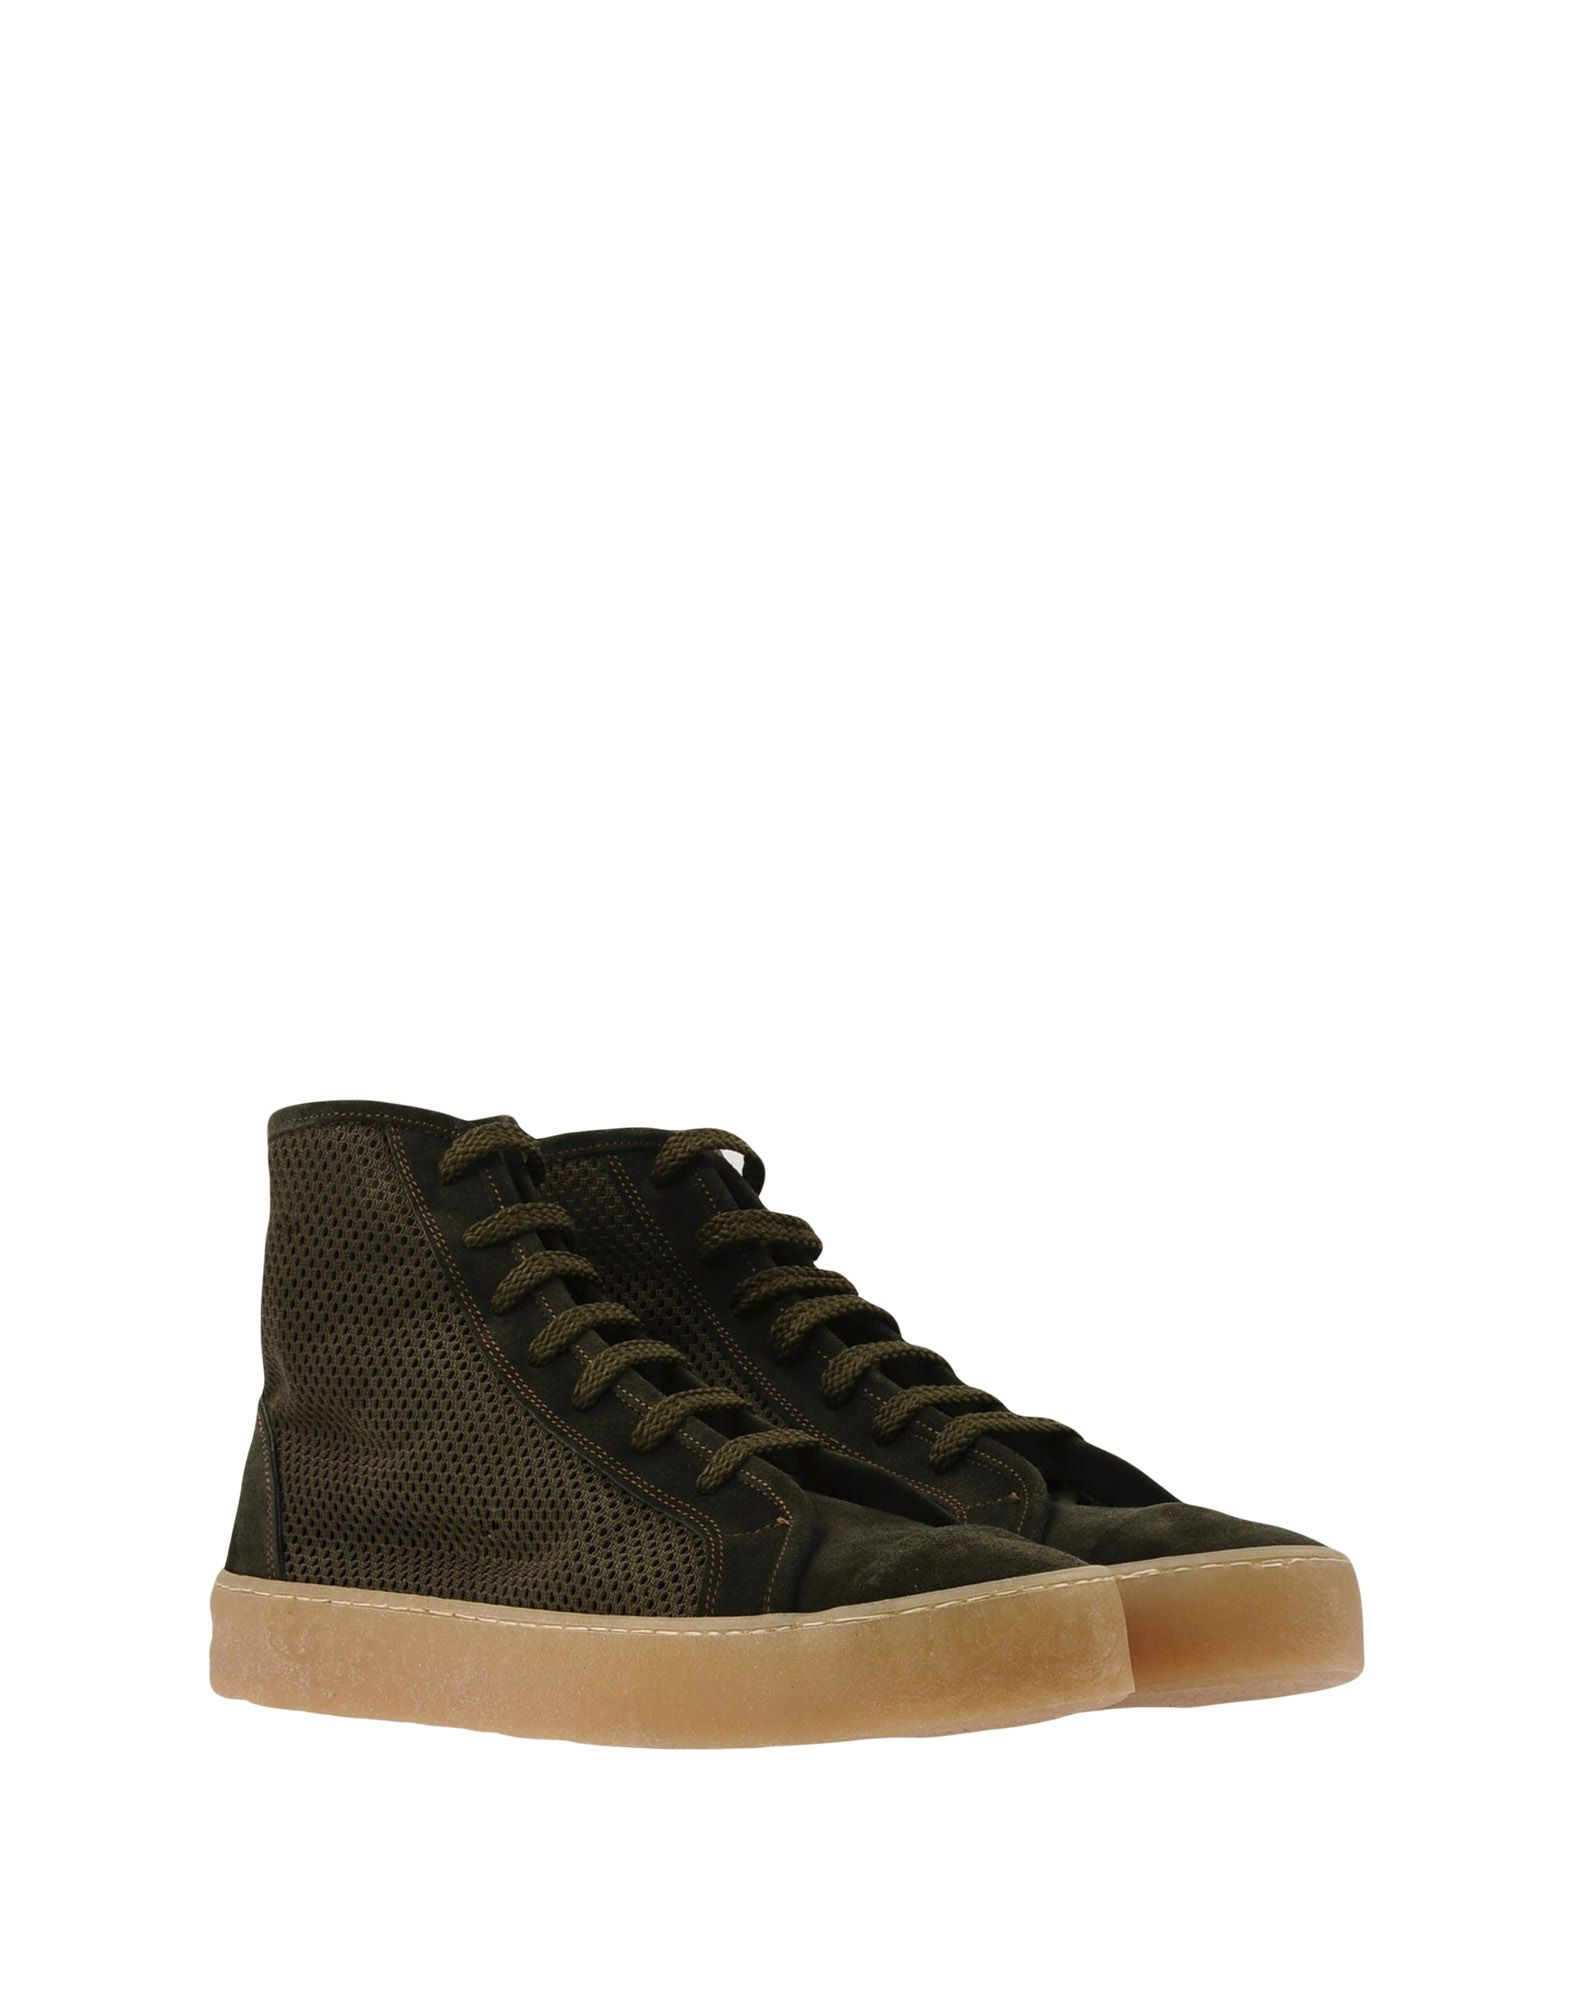 Pierre Darré Sneakers Herren  11456485IR Neue Neue 11456485IR Schuhe a02377